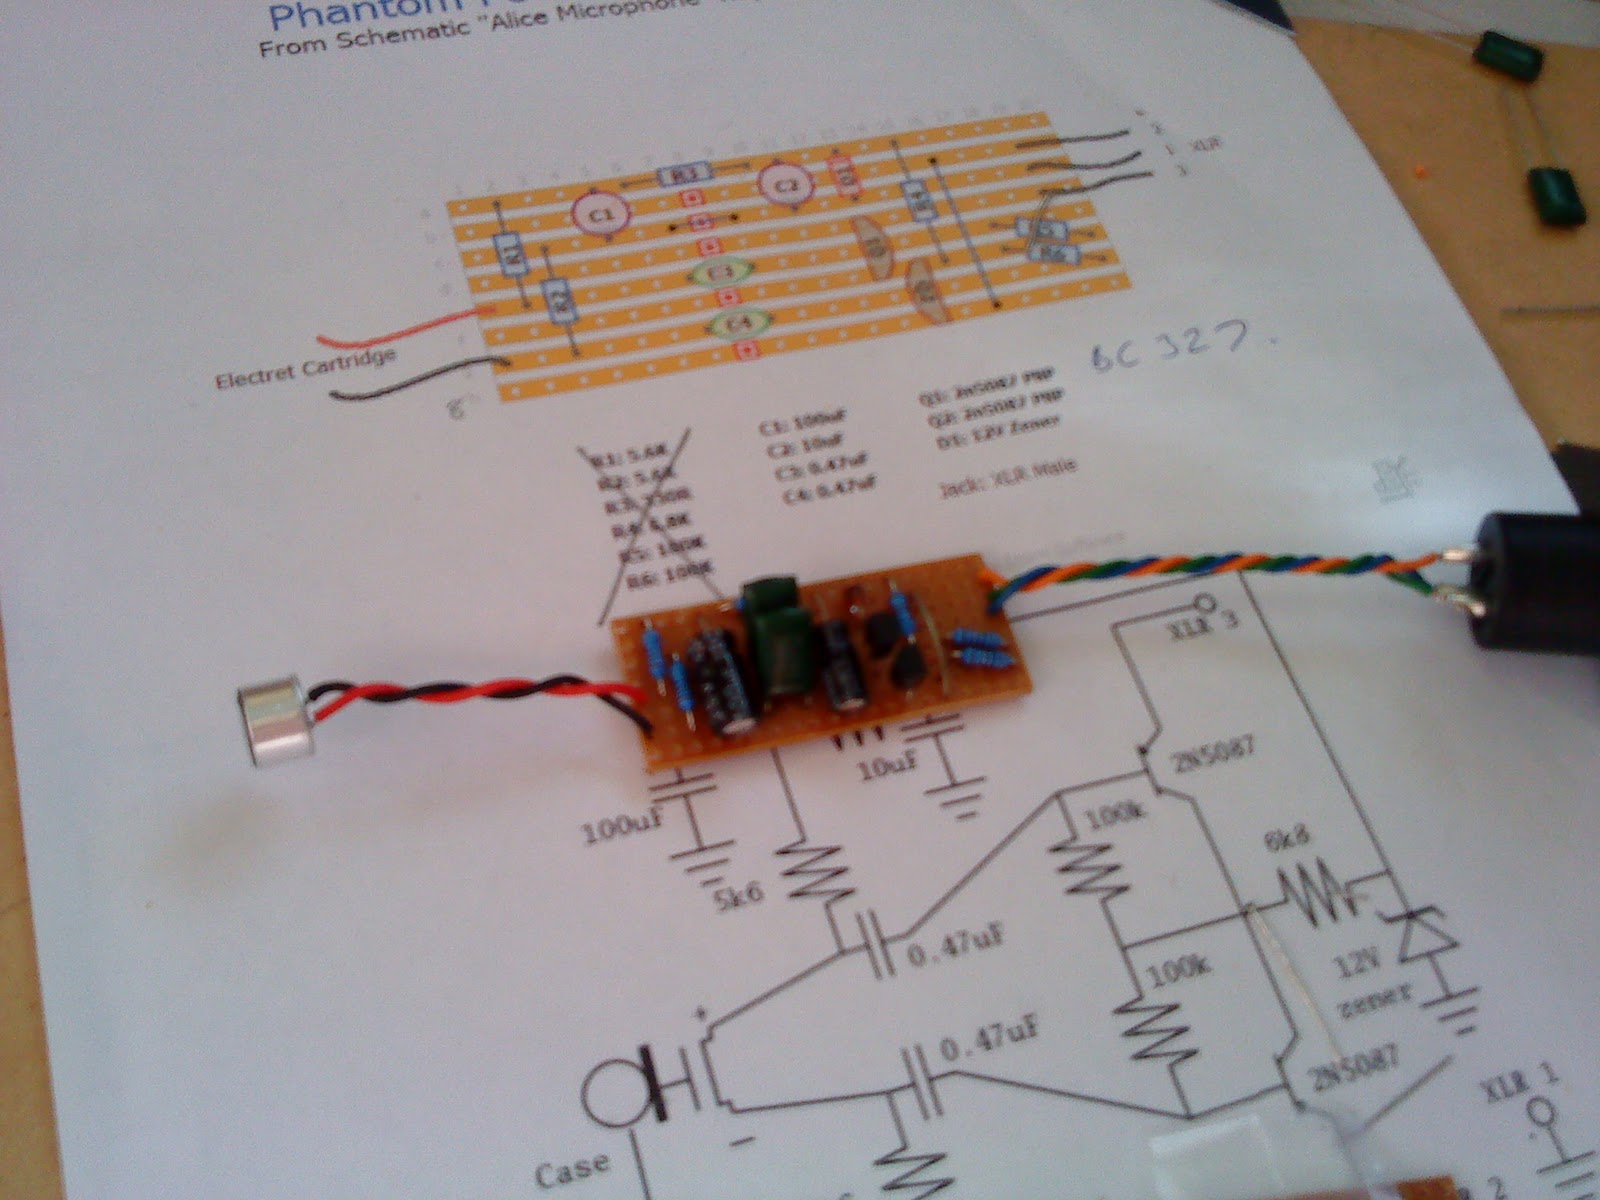 Mic Circuit Design